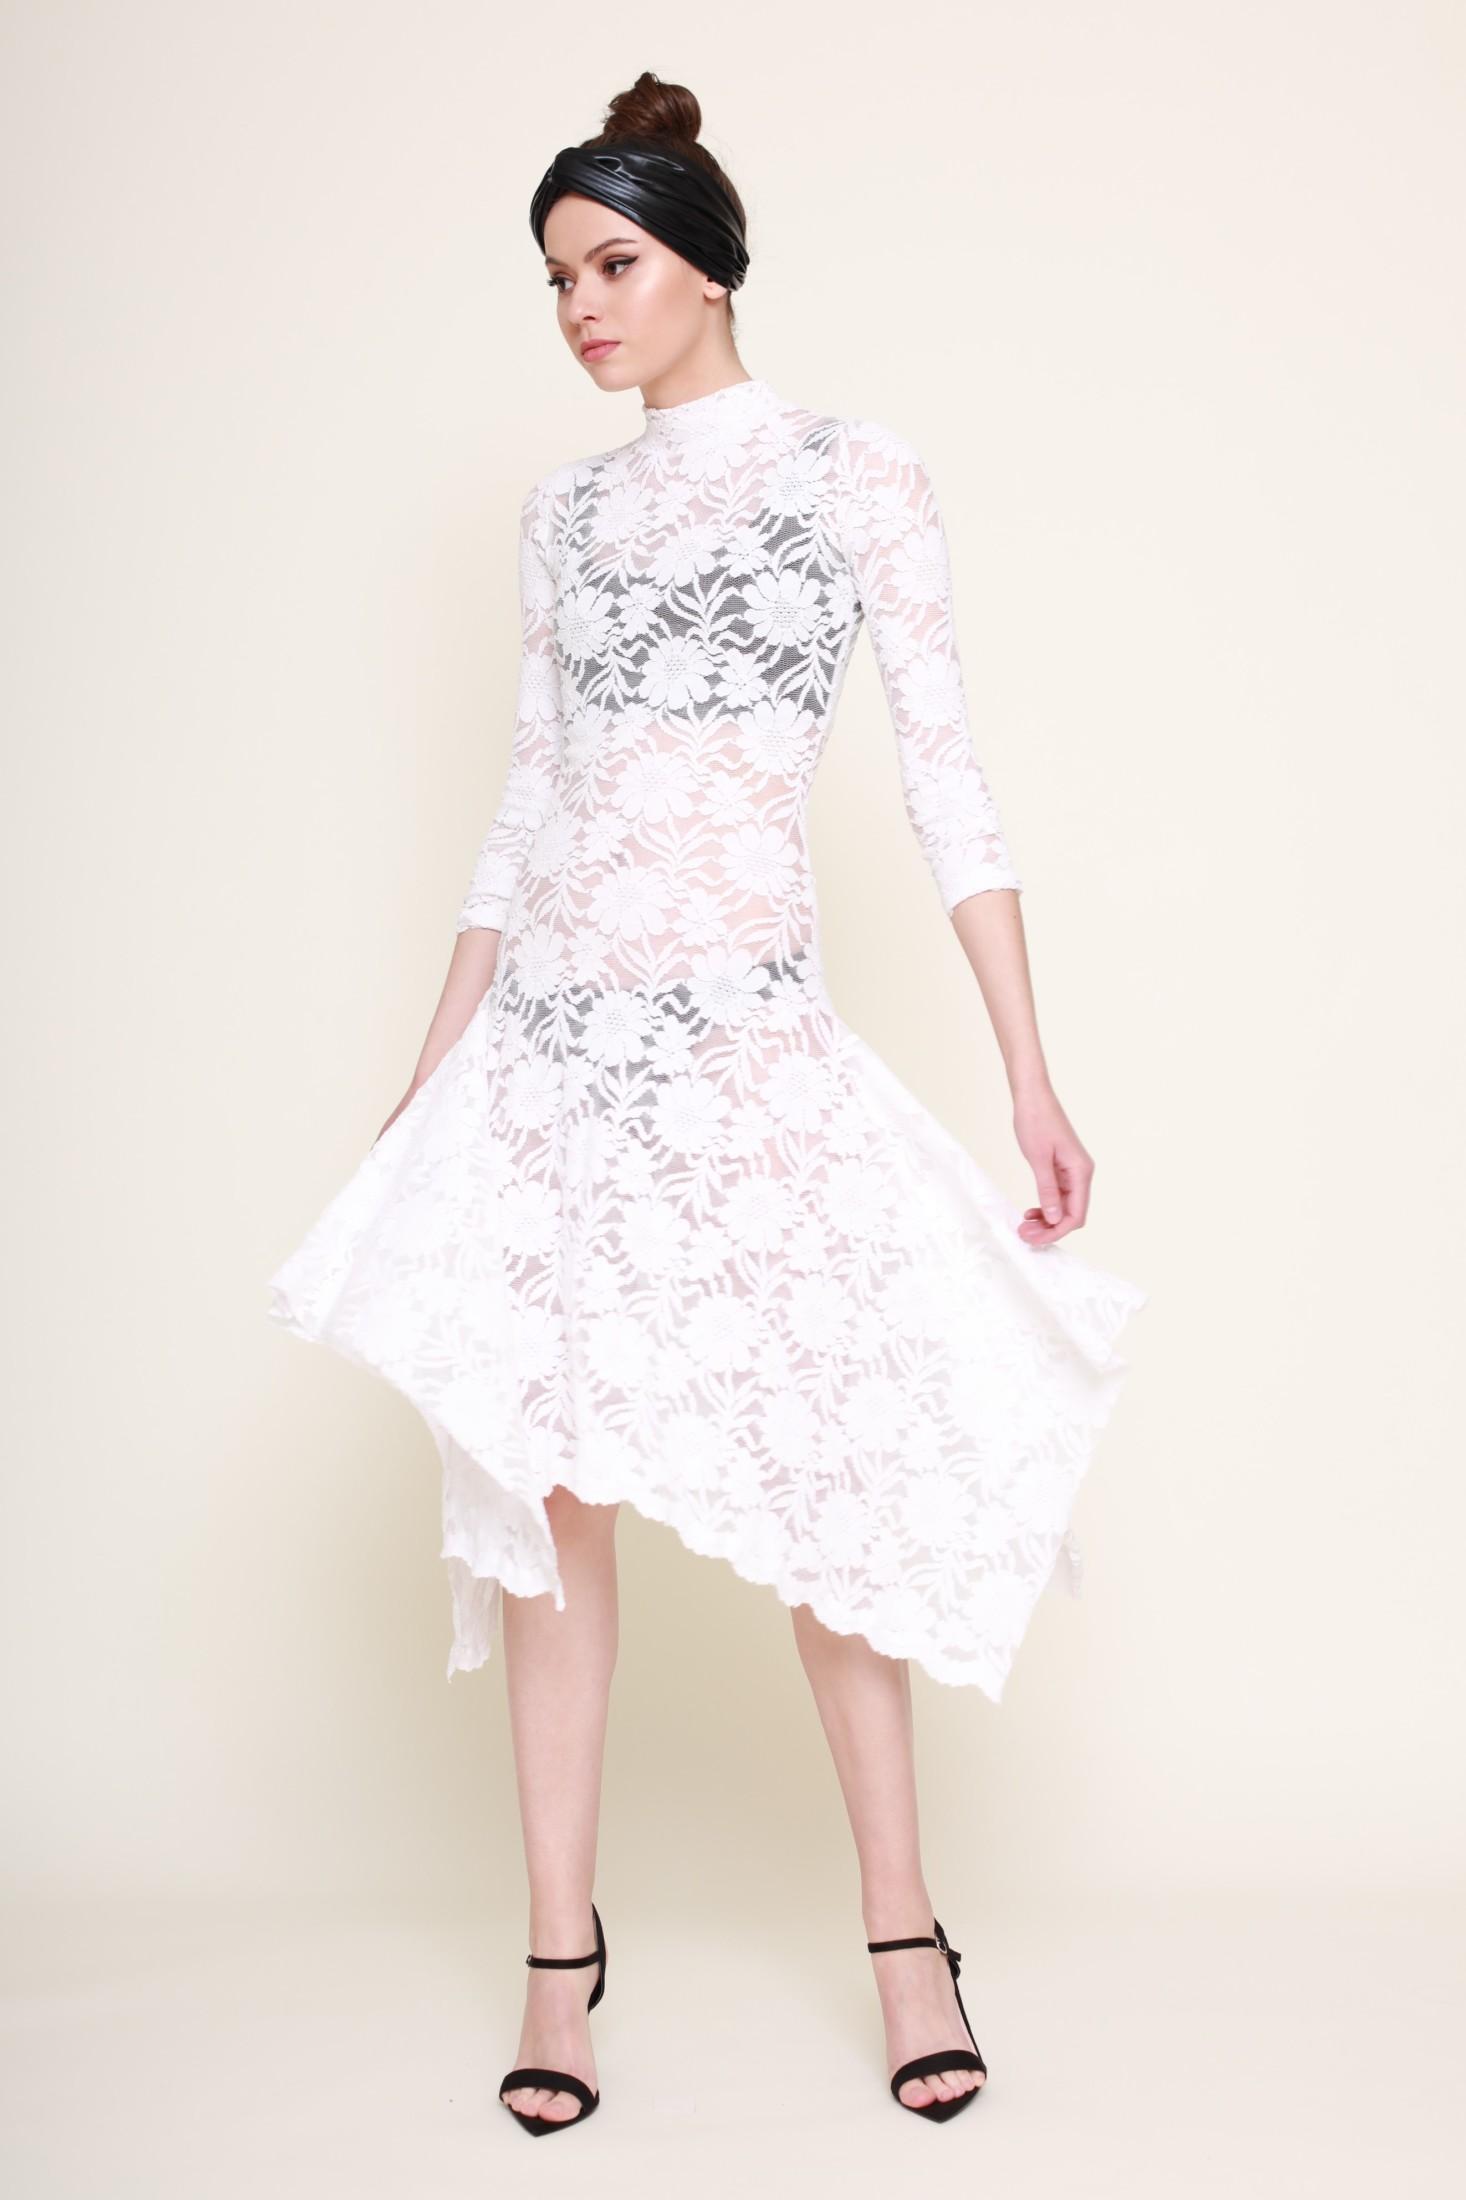 1aaec21f1dc6 Domov   Kolekcia RTW Jar Leto 2019   Biele krajkové elastické šaty